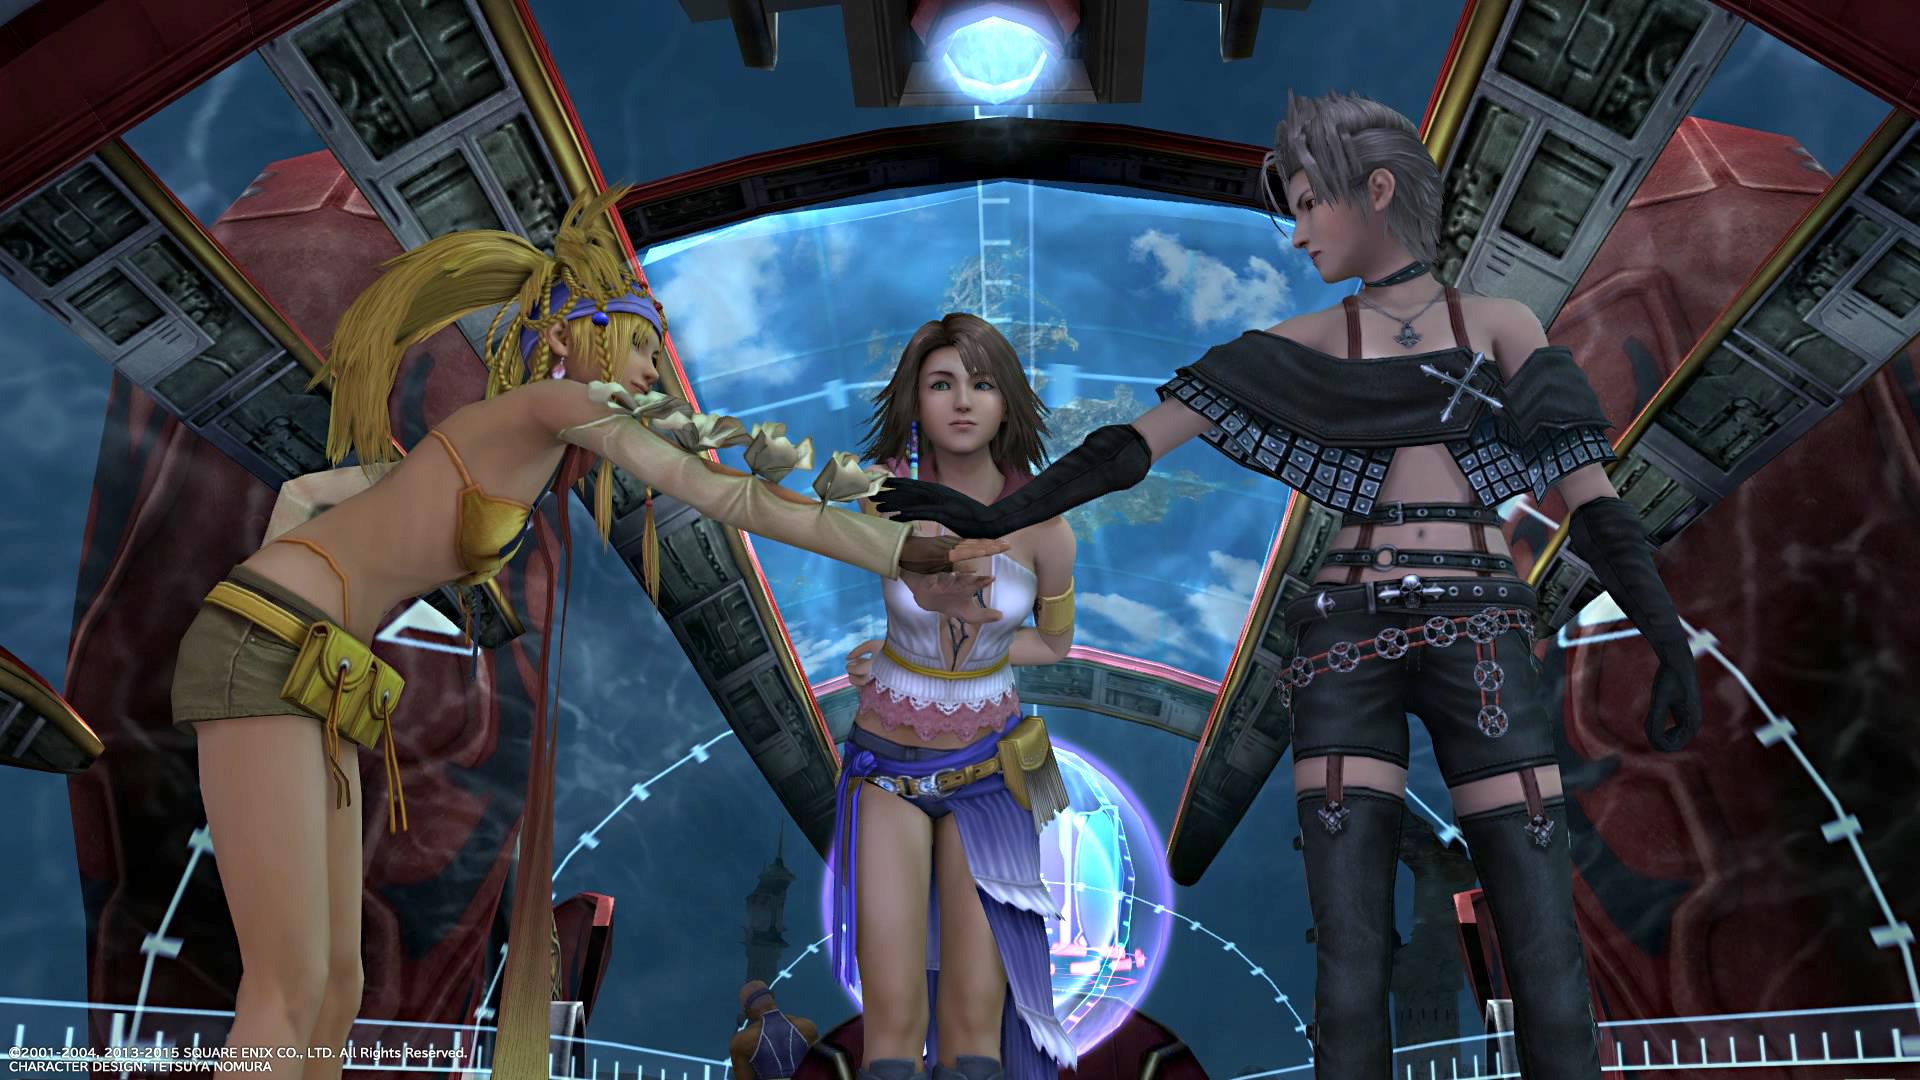 Final Fantasy X / X-2 HD Remaster Full Download